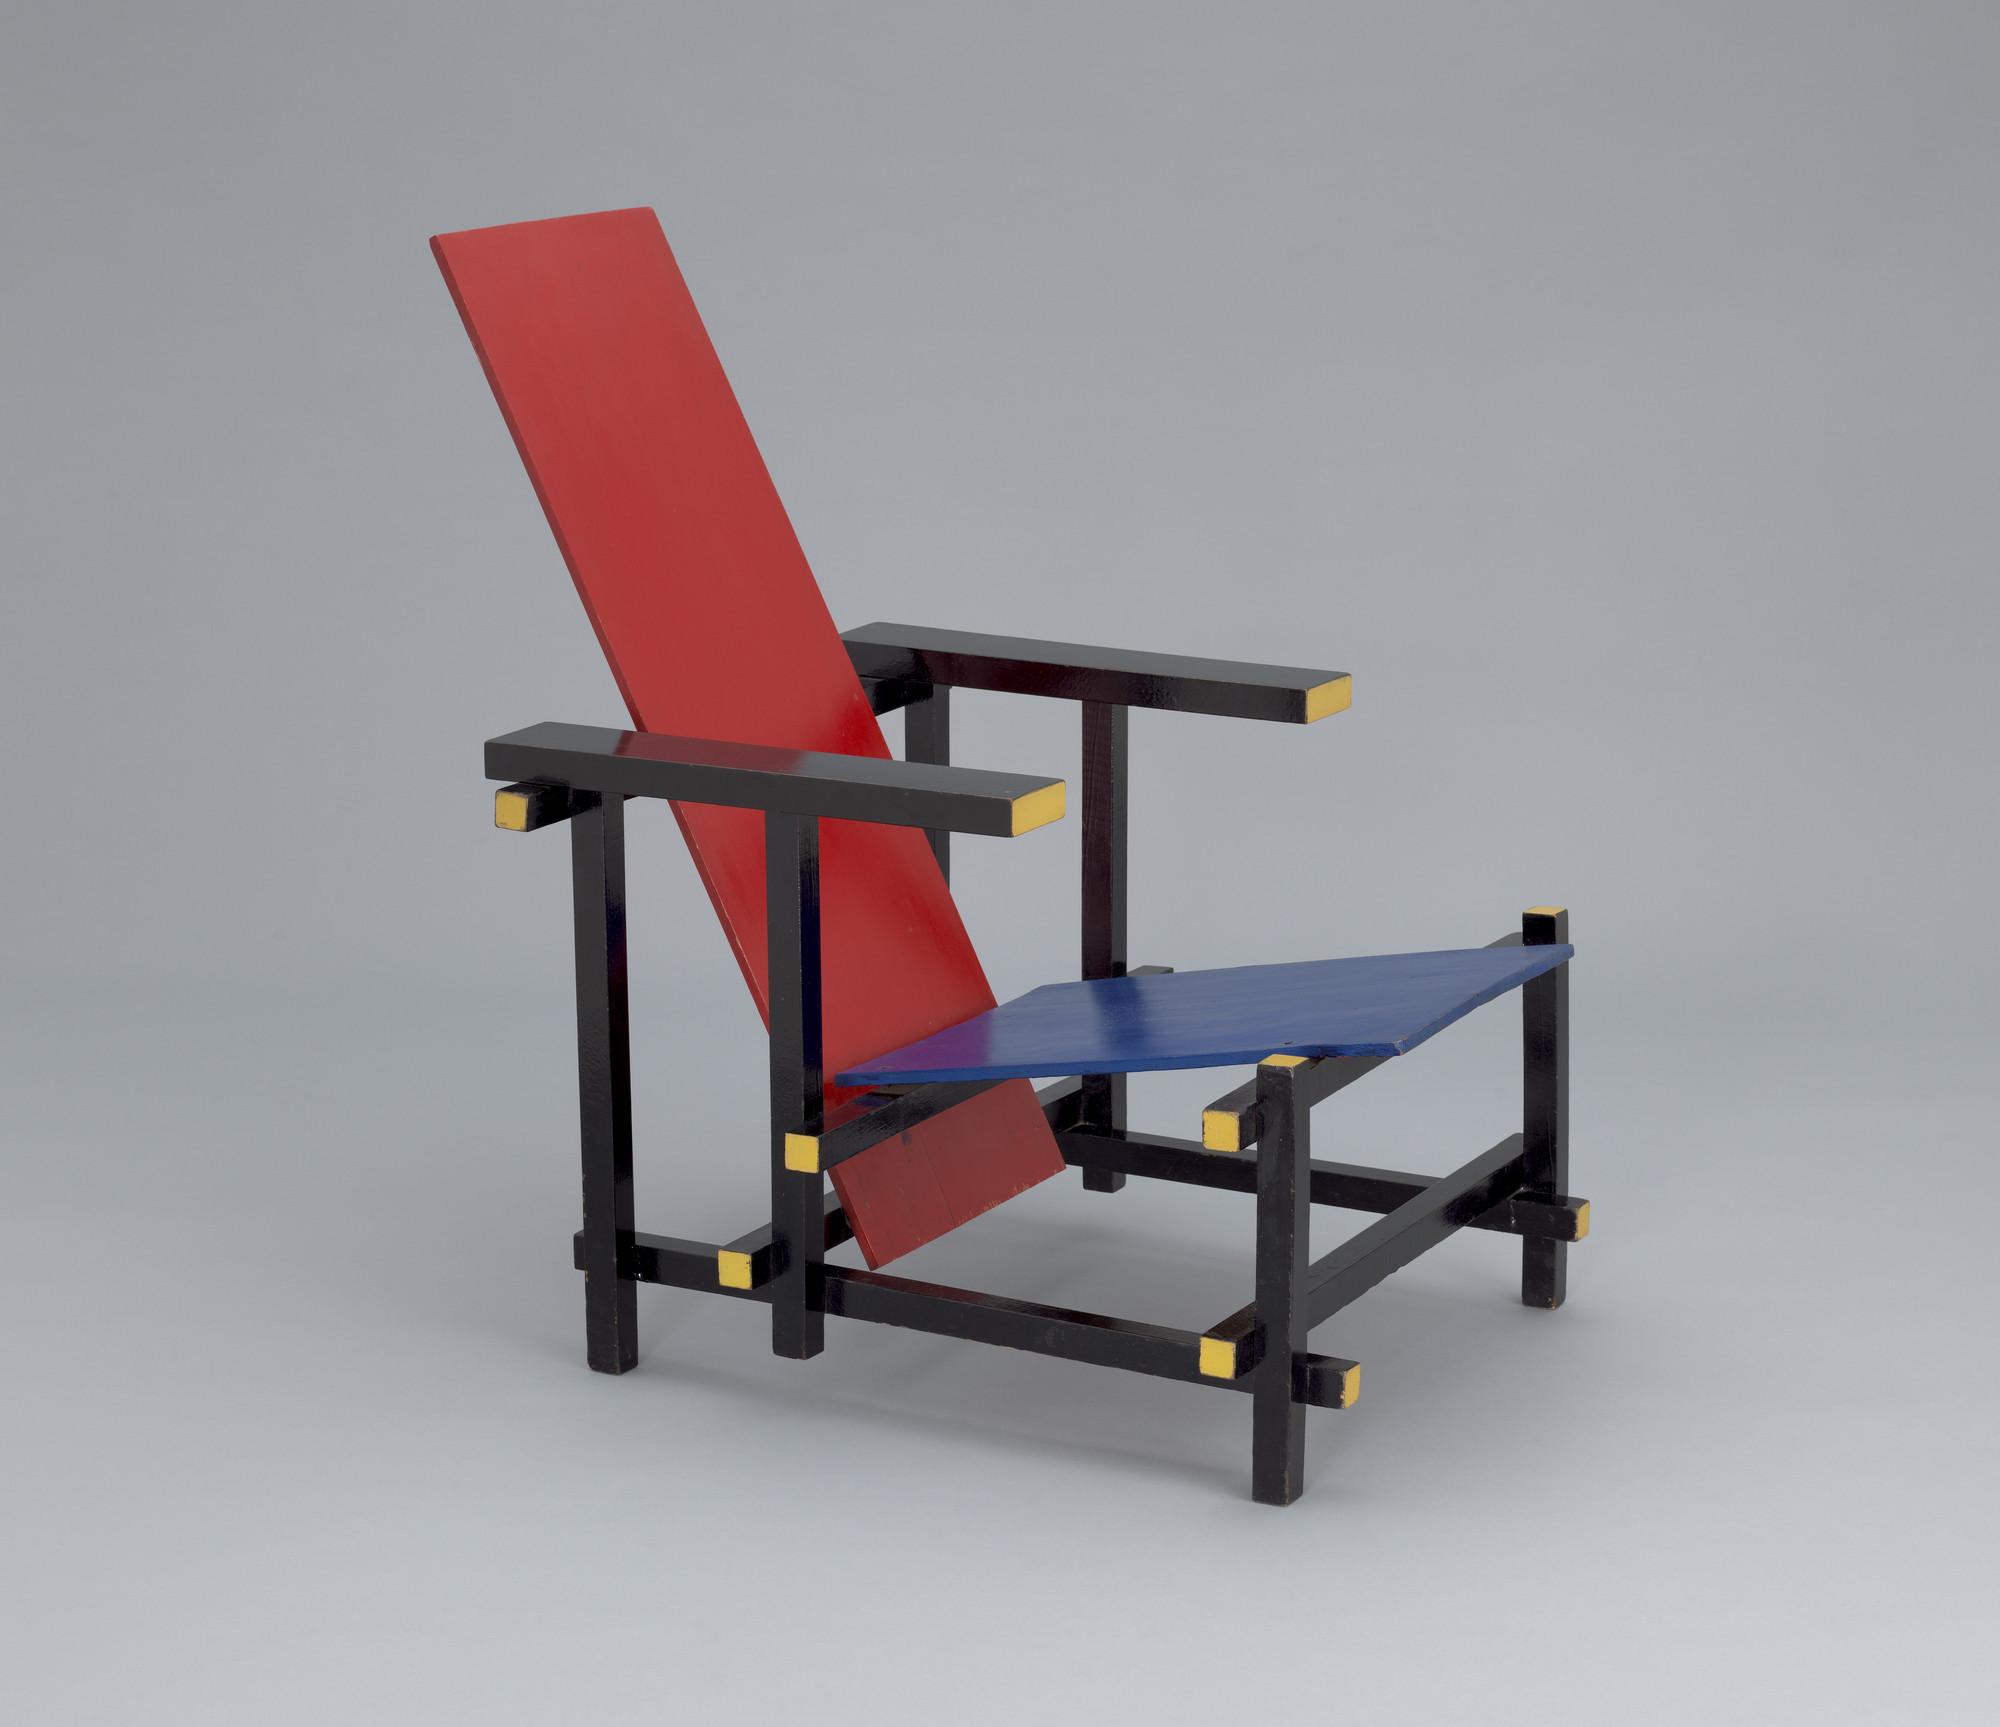 Awe Inspiring Gerrit Rietveld Red Blue Chair 19181923 Moma Frankydiablos Diy Chair Ideas Frankydiabloscom